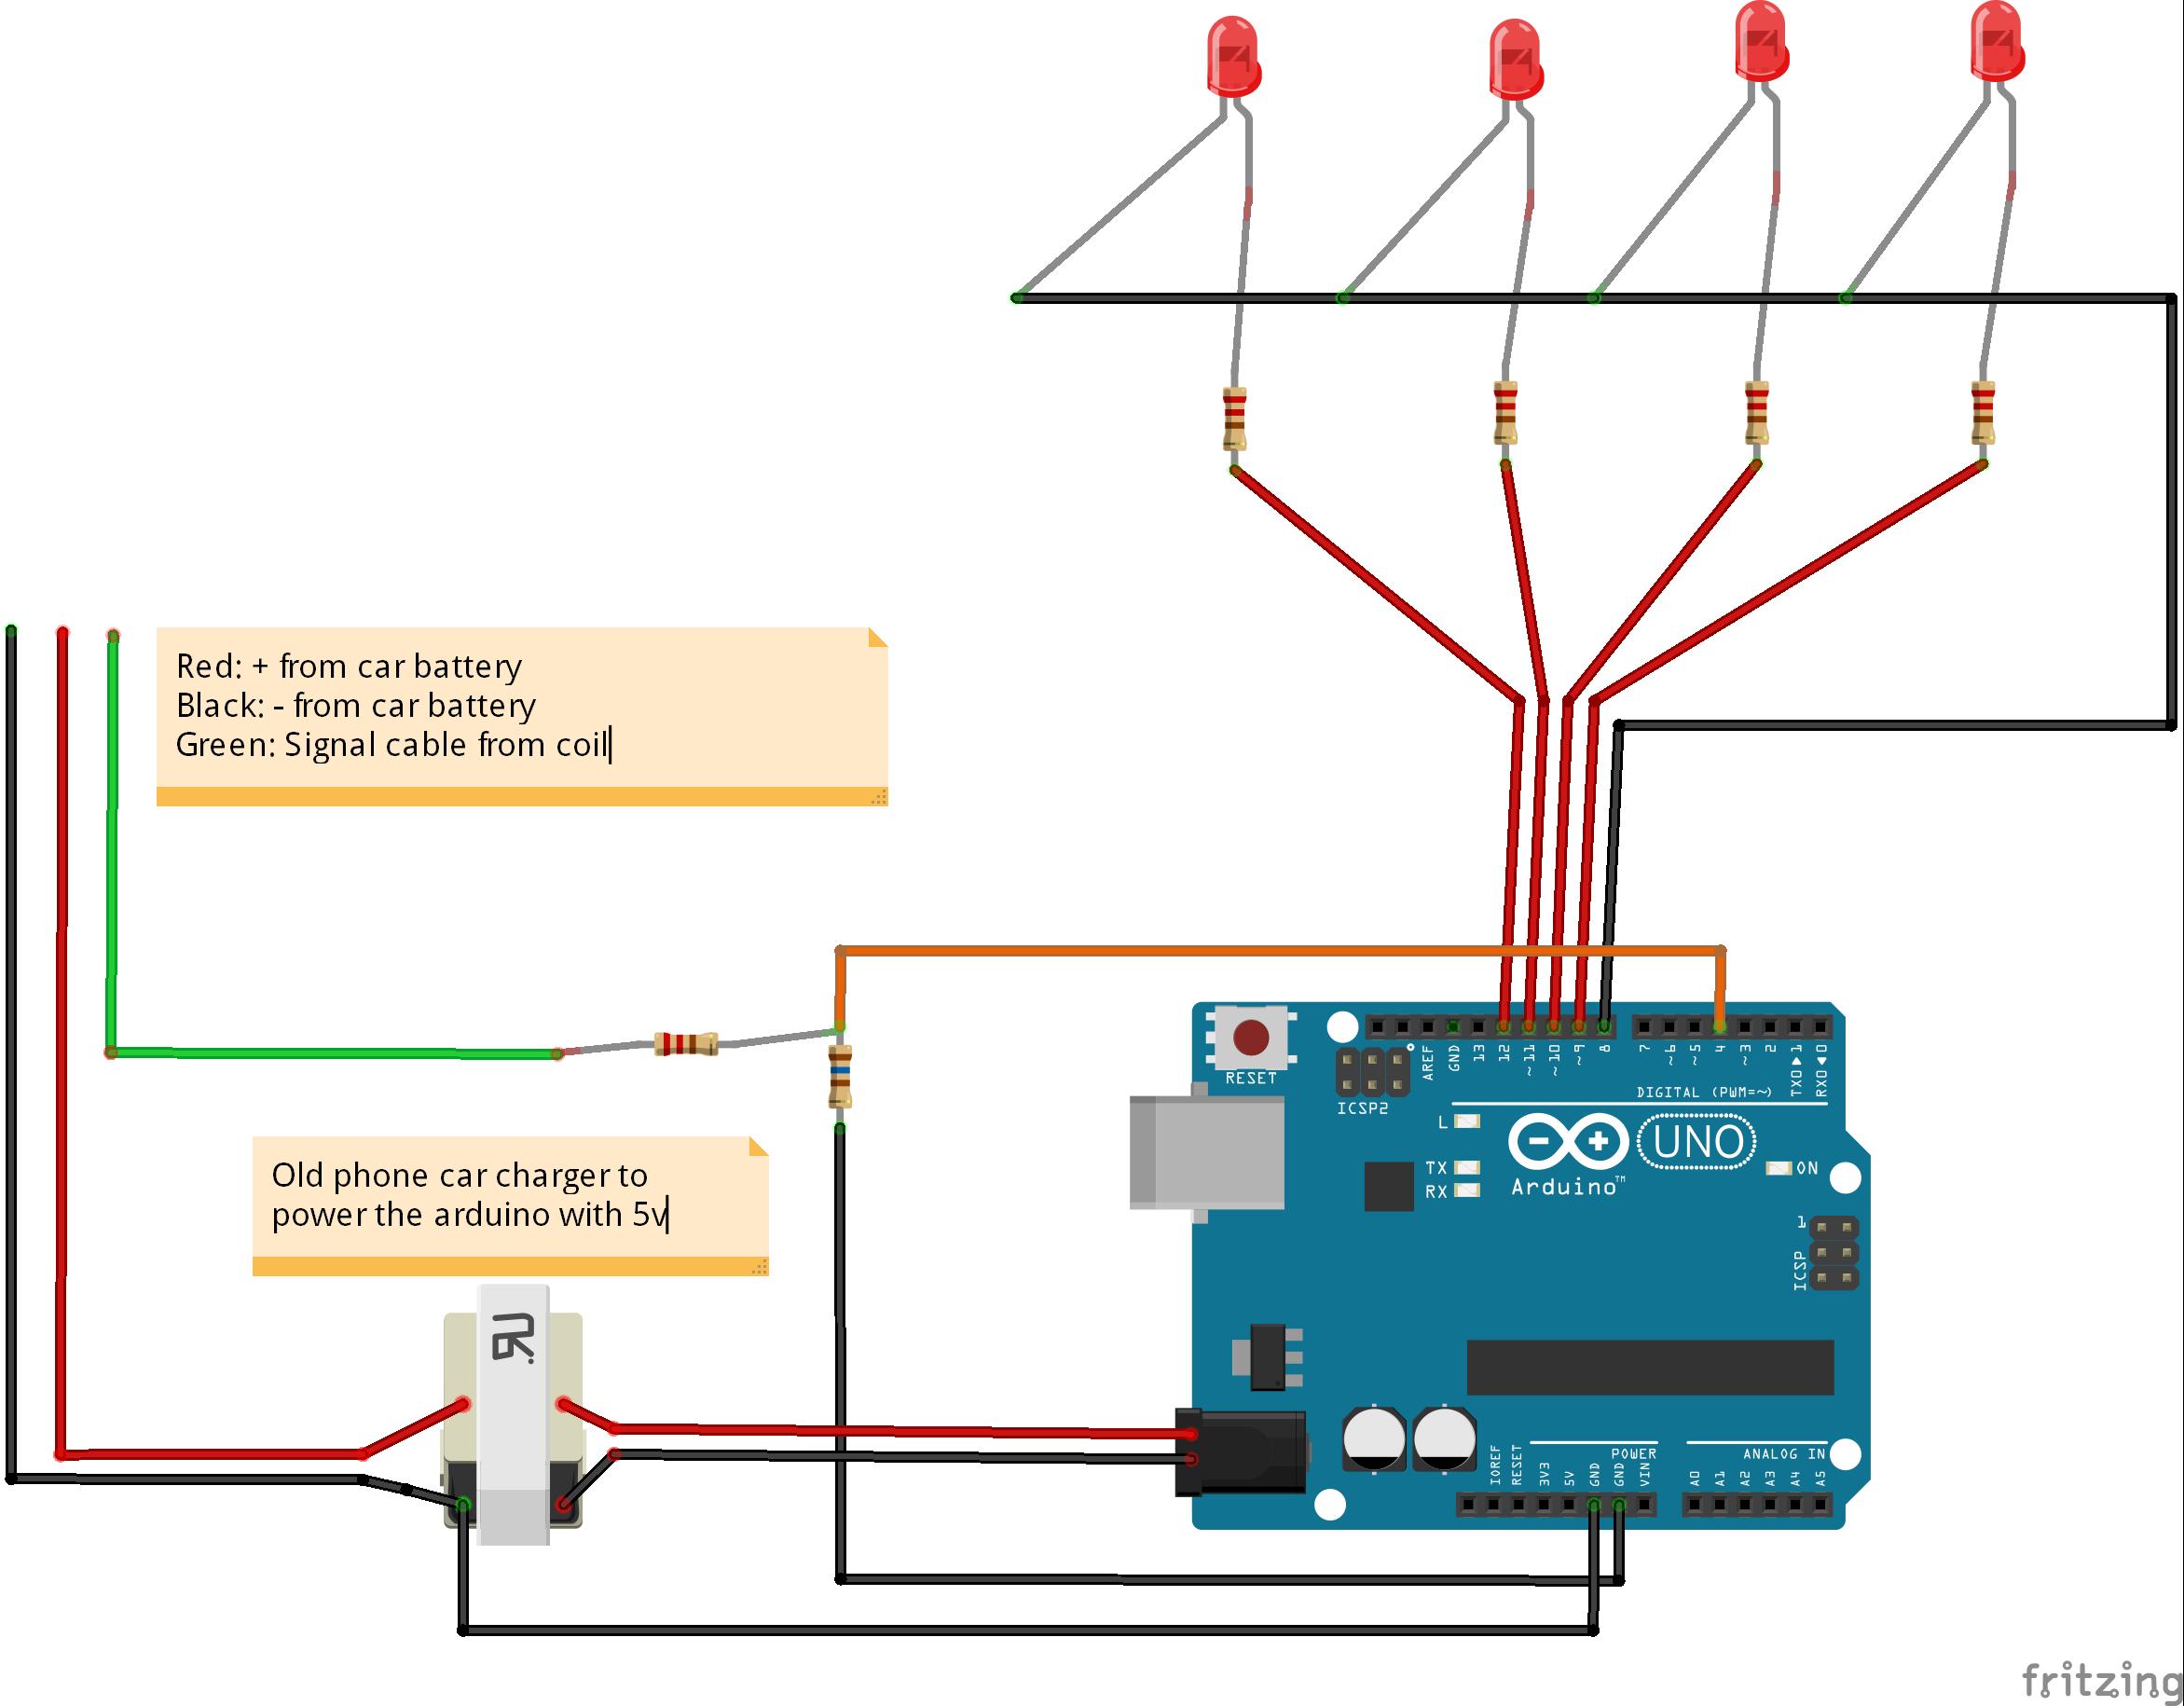 Auto Meter Electronic Speedometer Wiring Diagram Schematics Autometer Tach Schematic Tachometer Electric Gauge